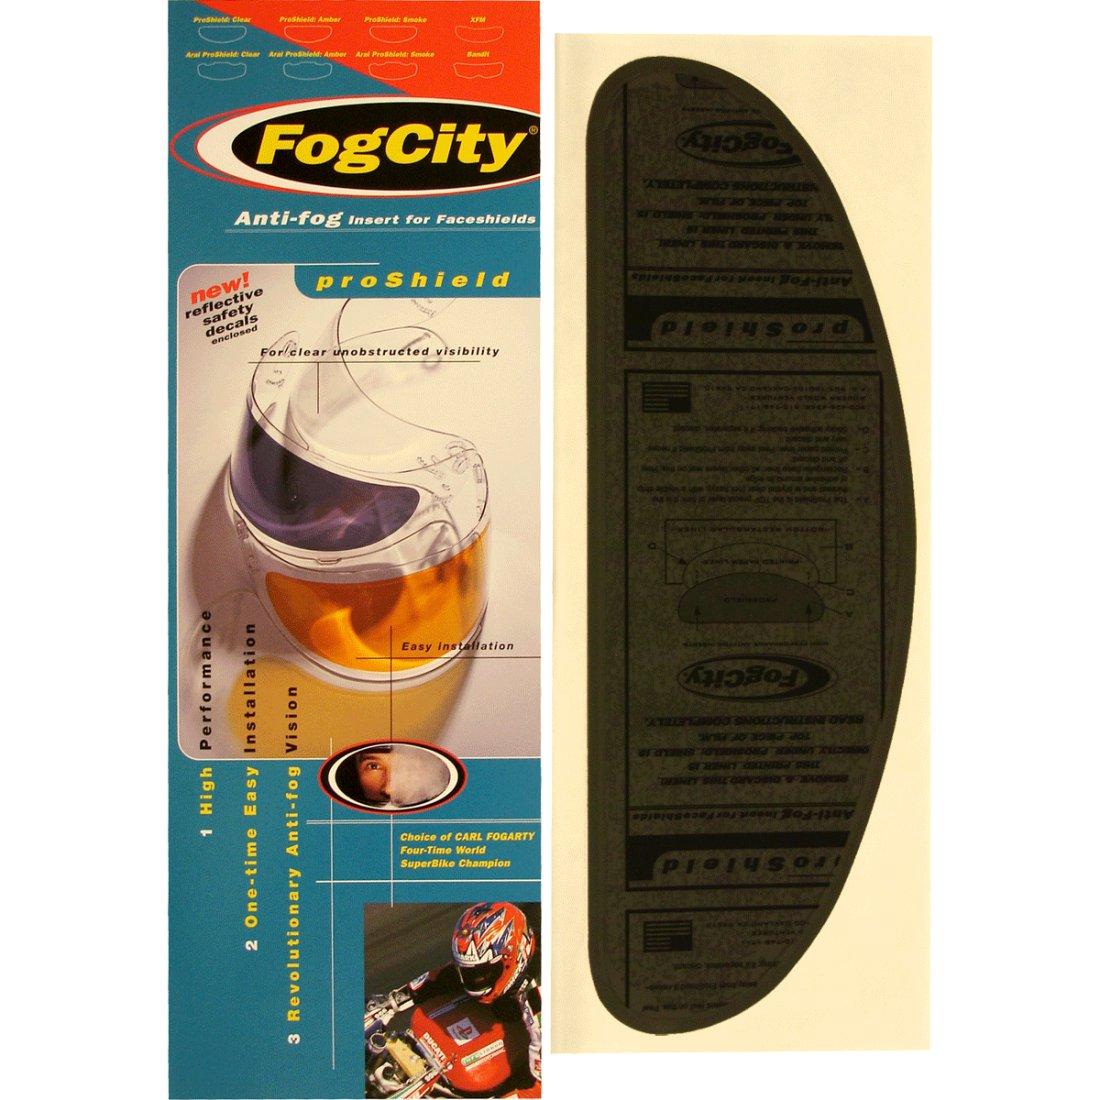 07667c40 FOG-CITY STANDARD OSC. Helmet accessory · Motocard